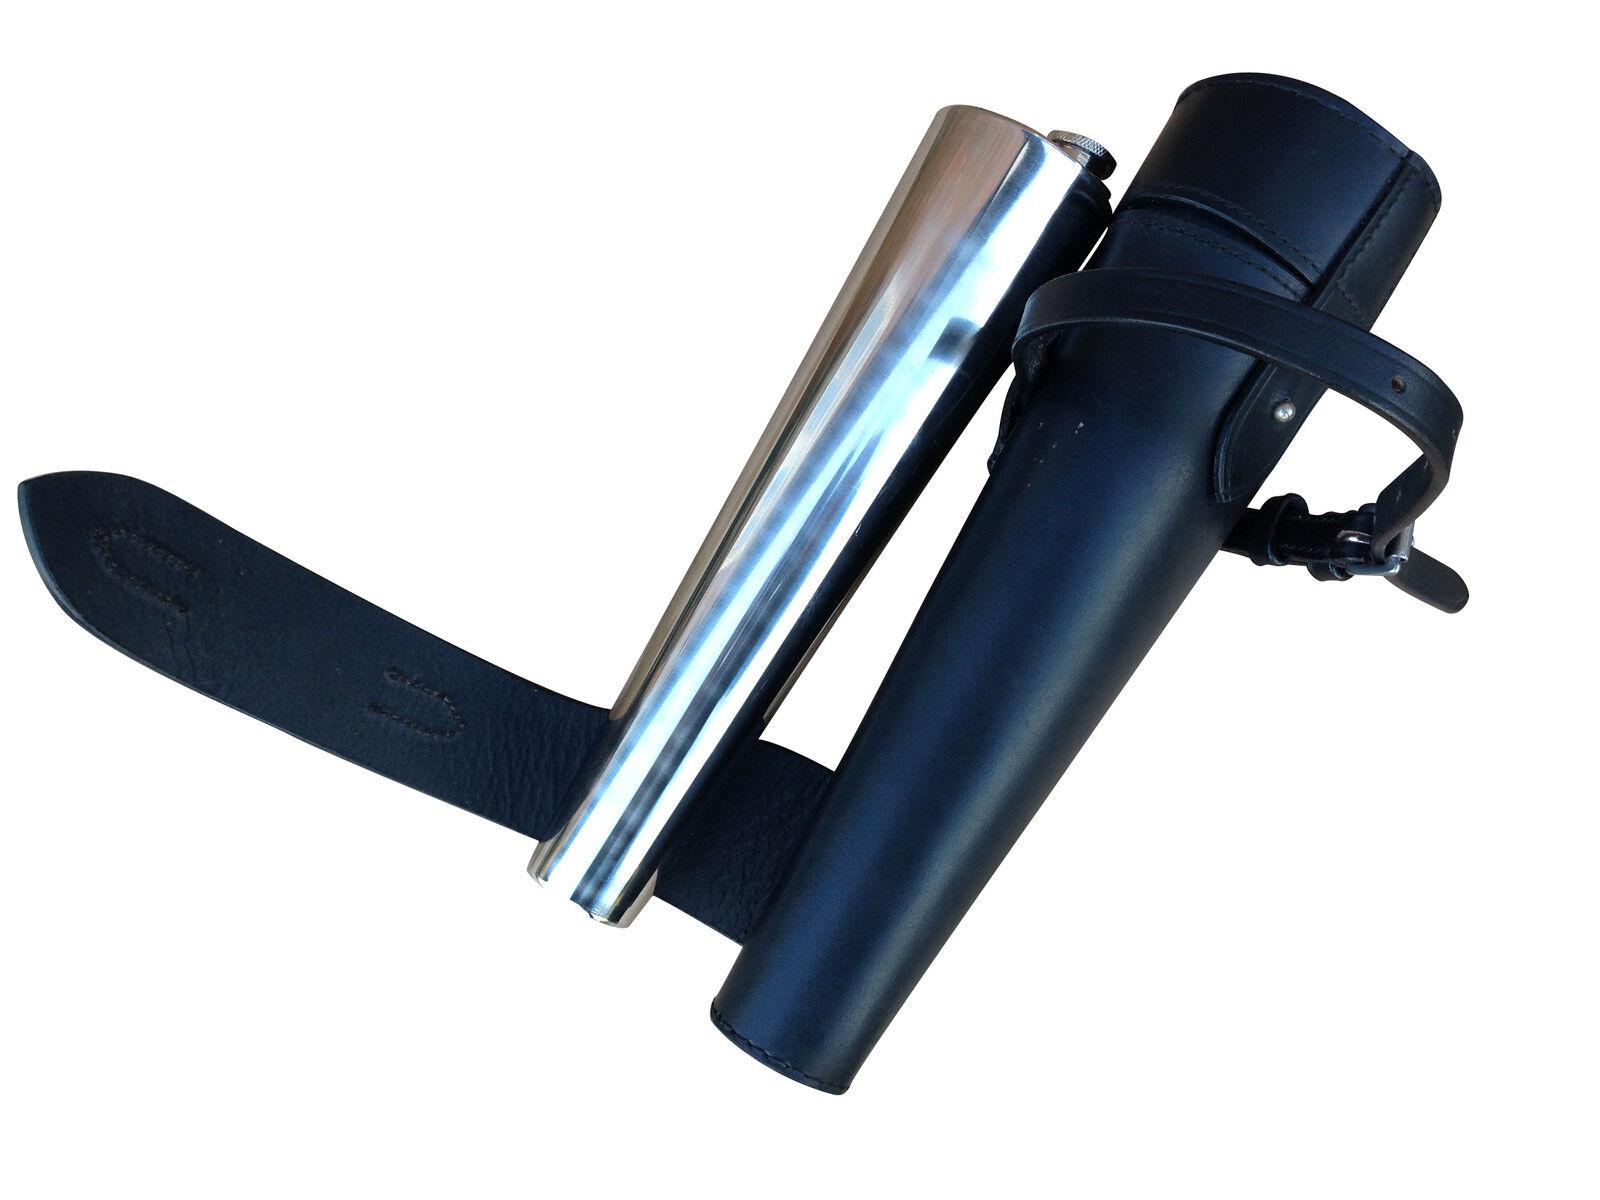 Briglia Pelle Equitazione Sella Bevande Flask capacità 400ml-SPEDIZIONE GRATUITA GRATUITA GRATUITA 0c1593